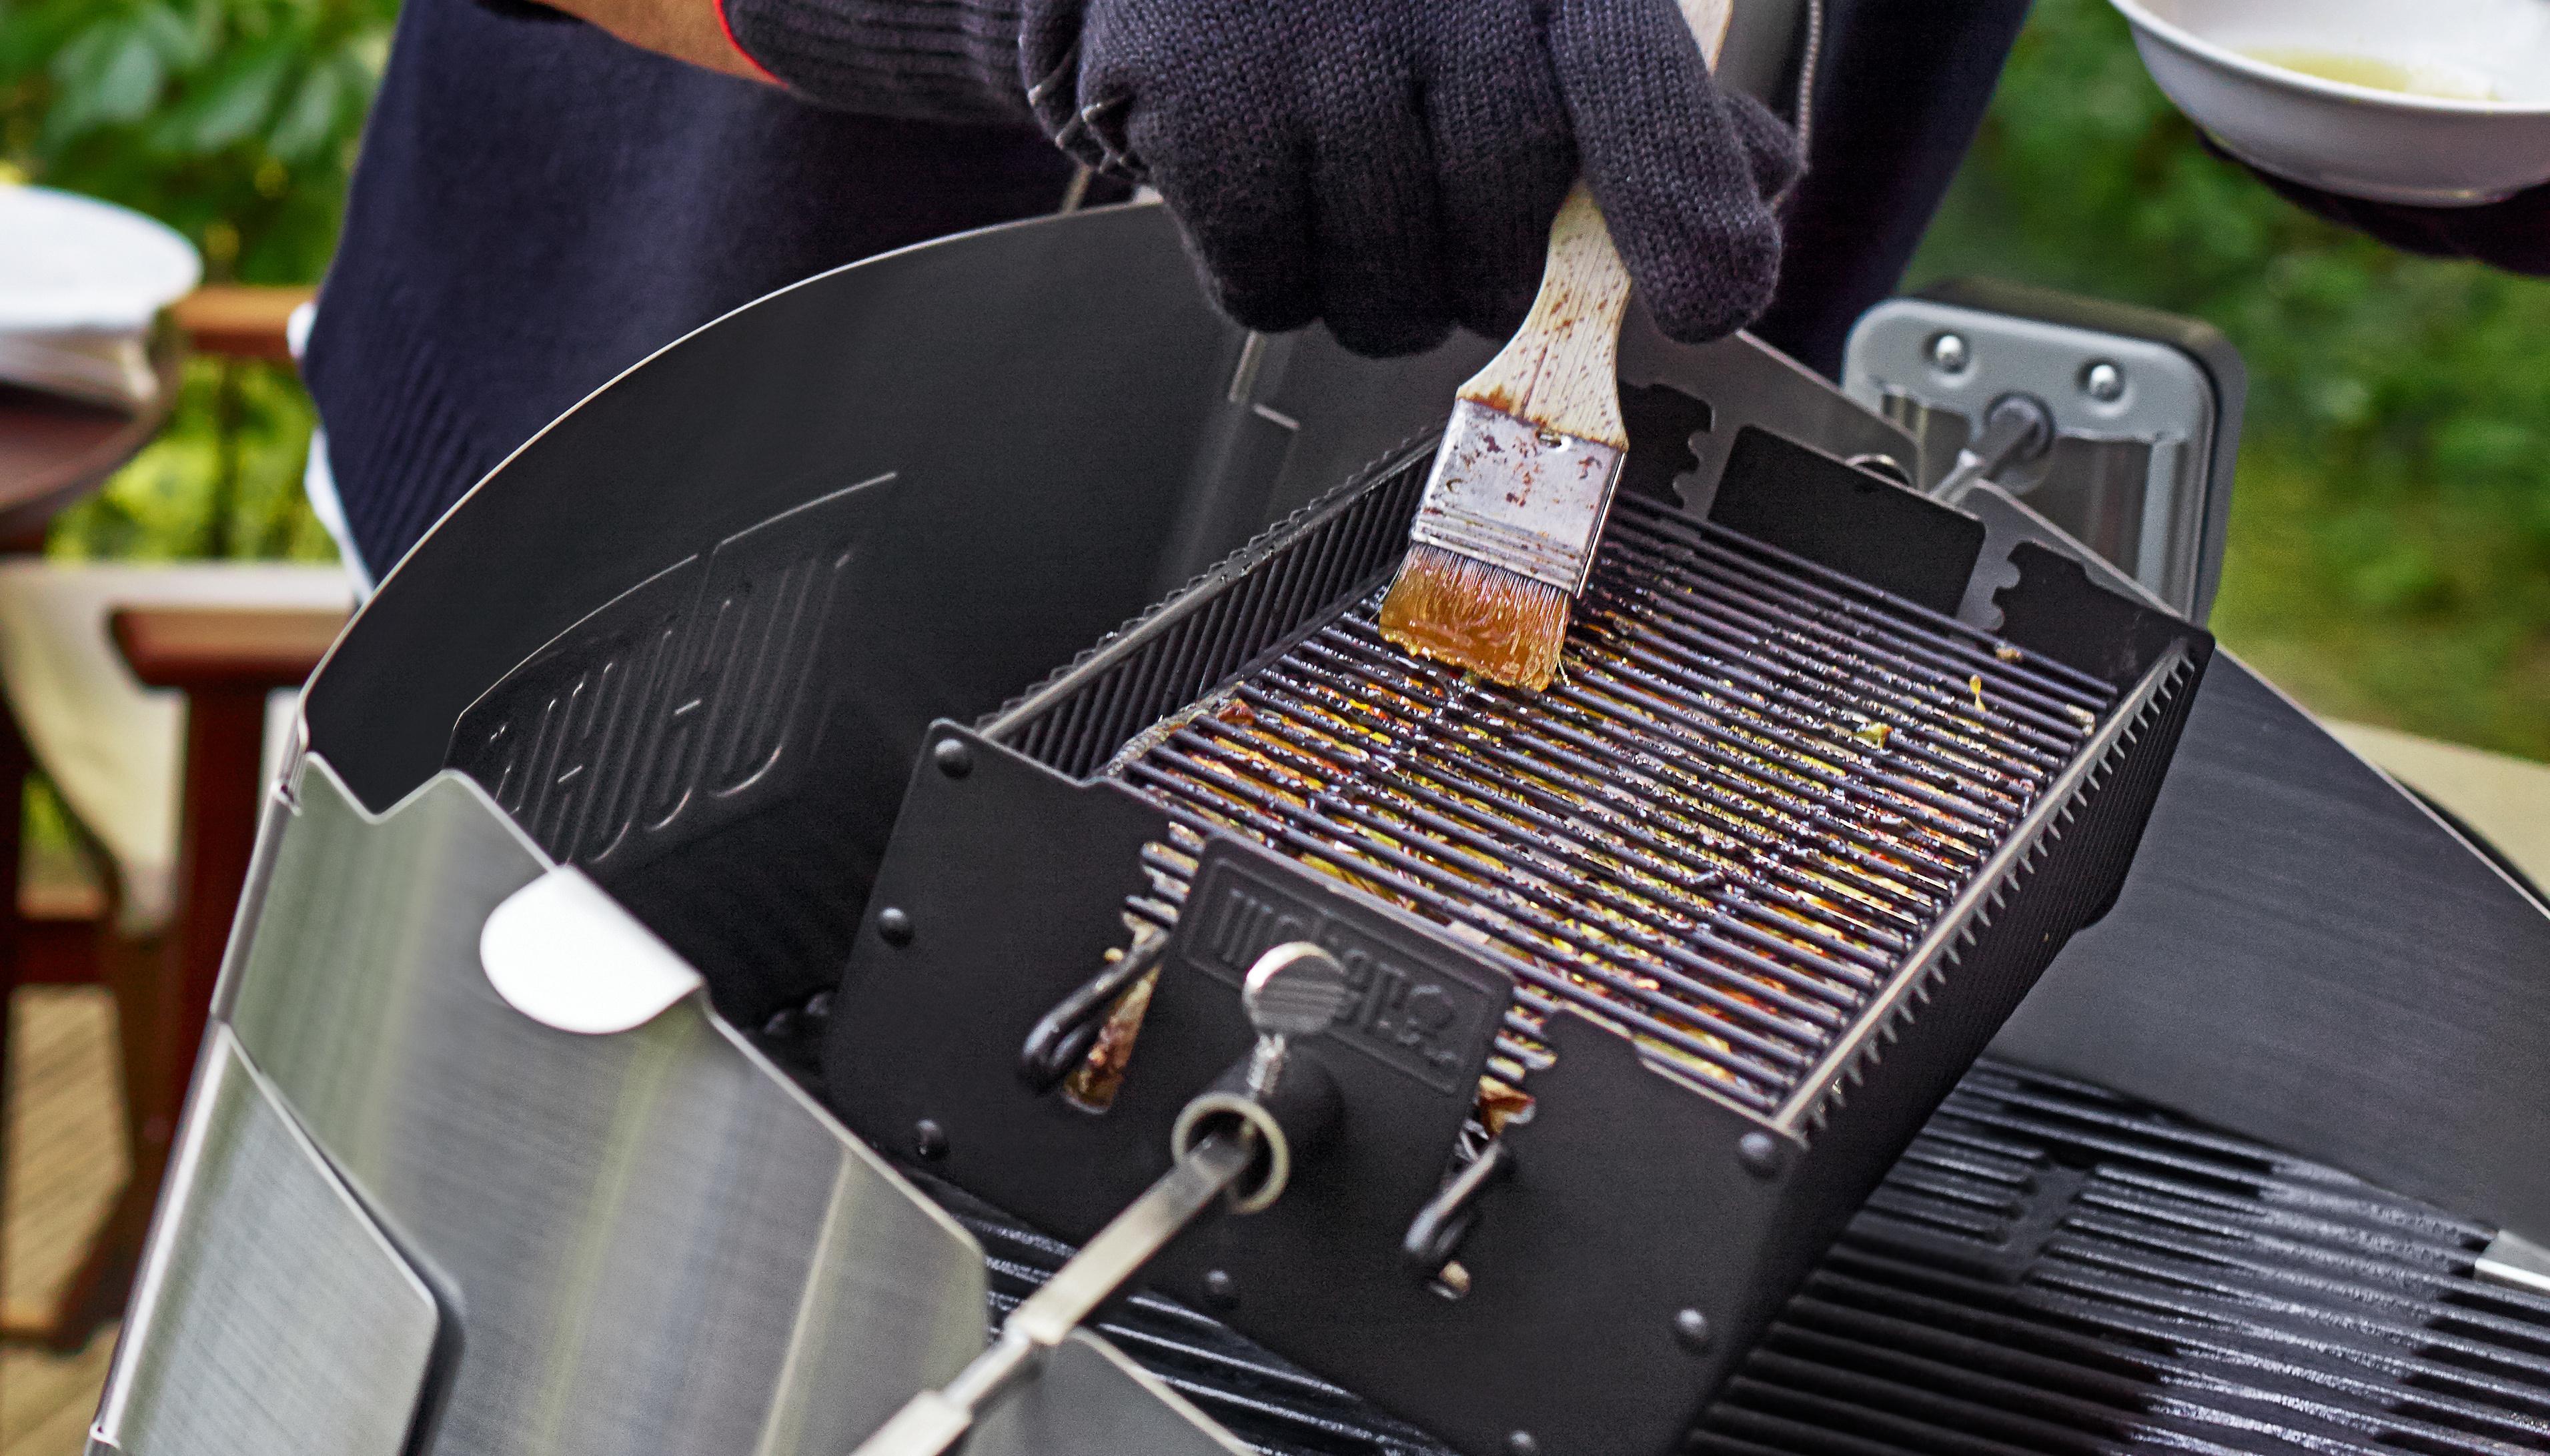 Weber Elektrogrill Edelstahl Rost : Edelstahl grillrost cm für kugelgrills weber napoleon etc